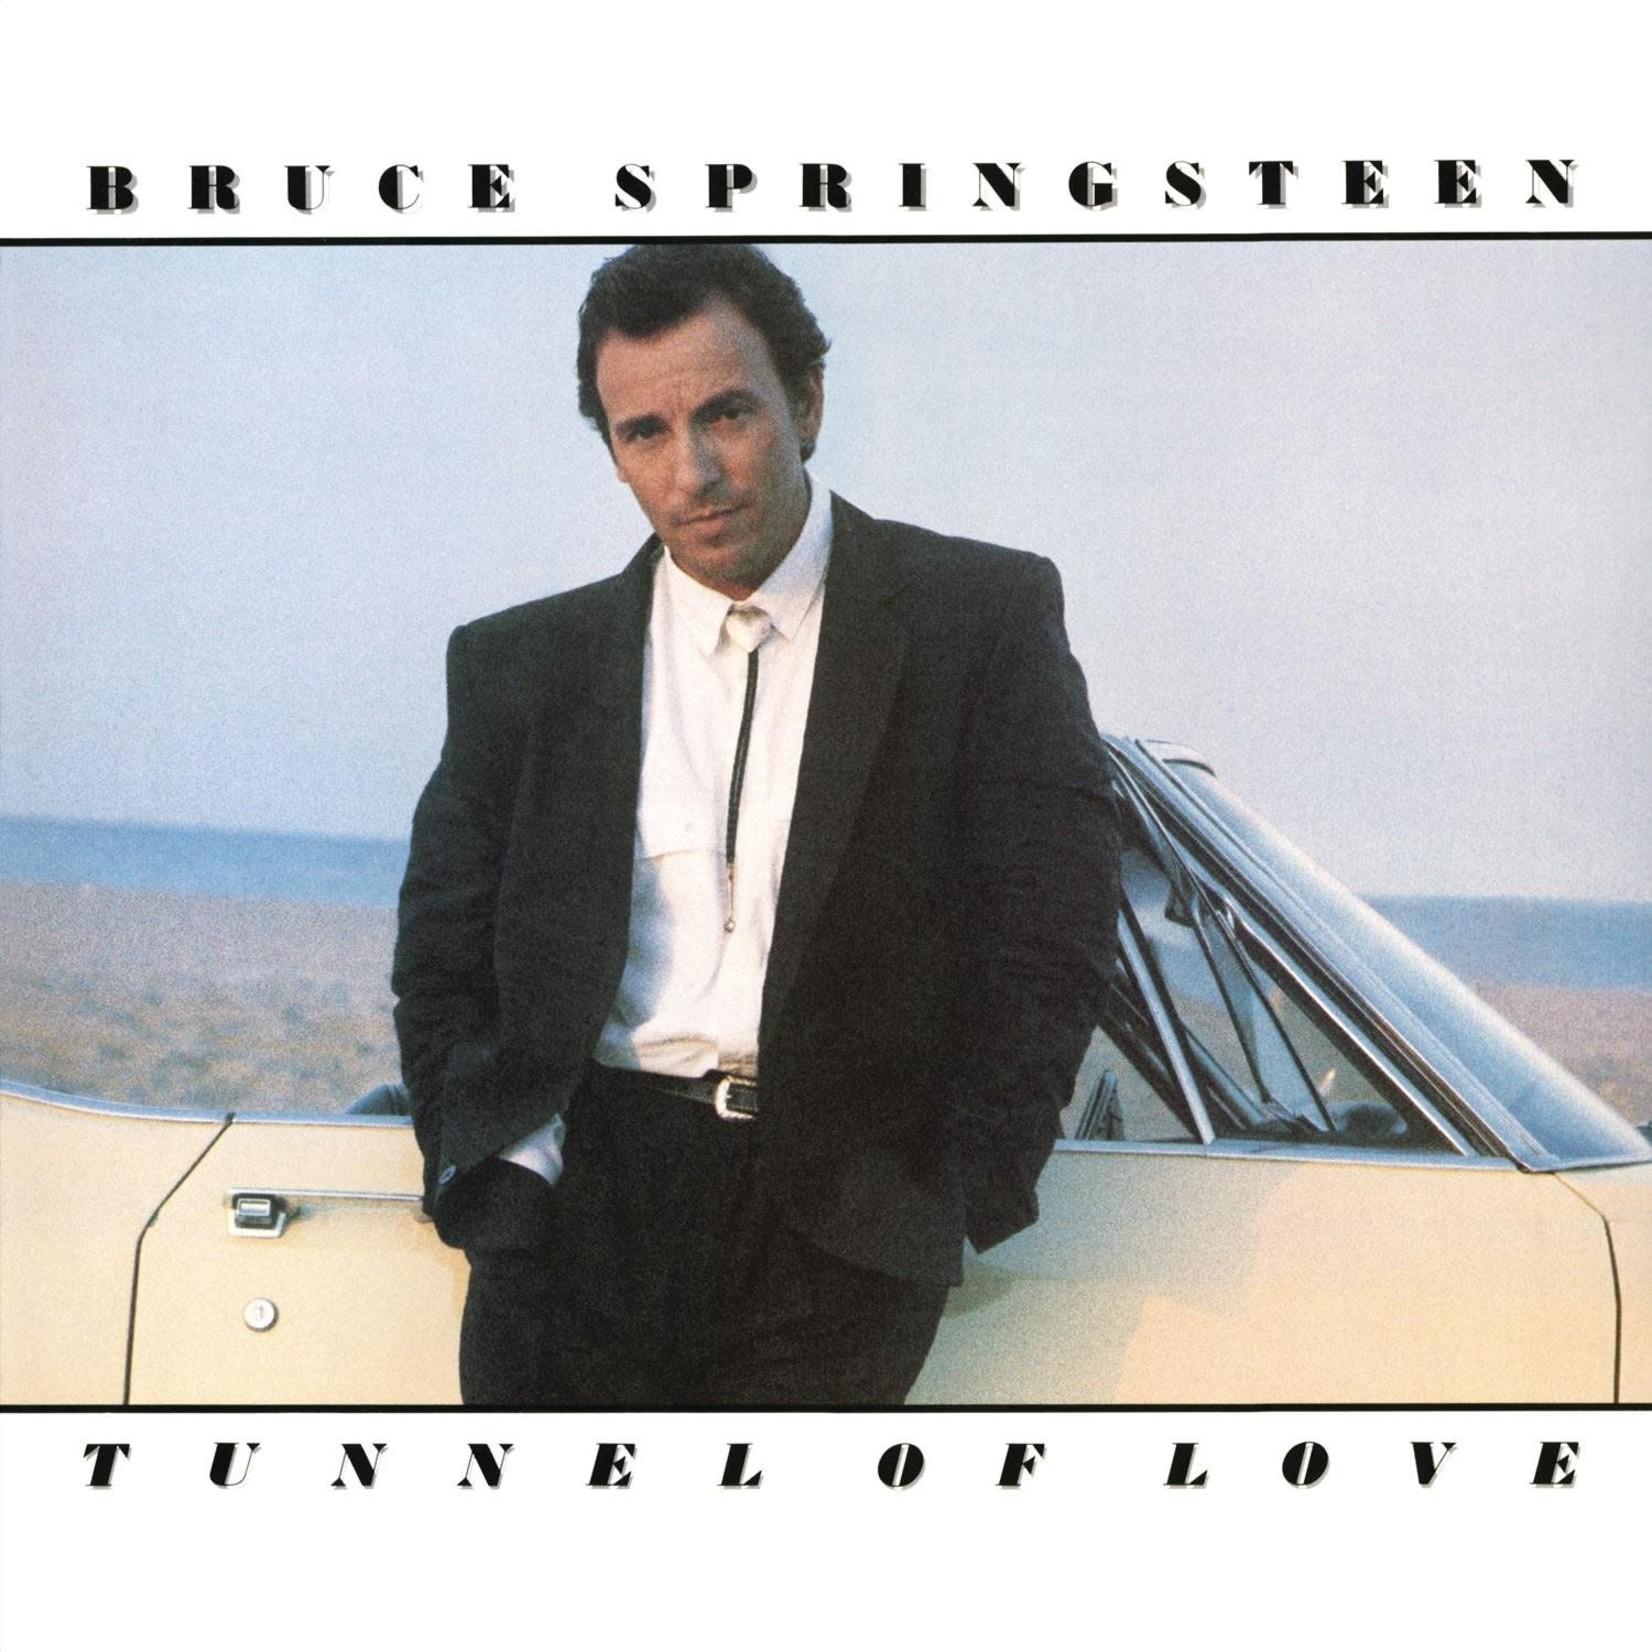 [Vintage] Springsteen, Bruce: Tunnel of Love